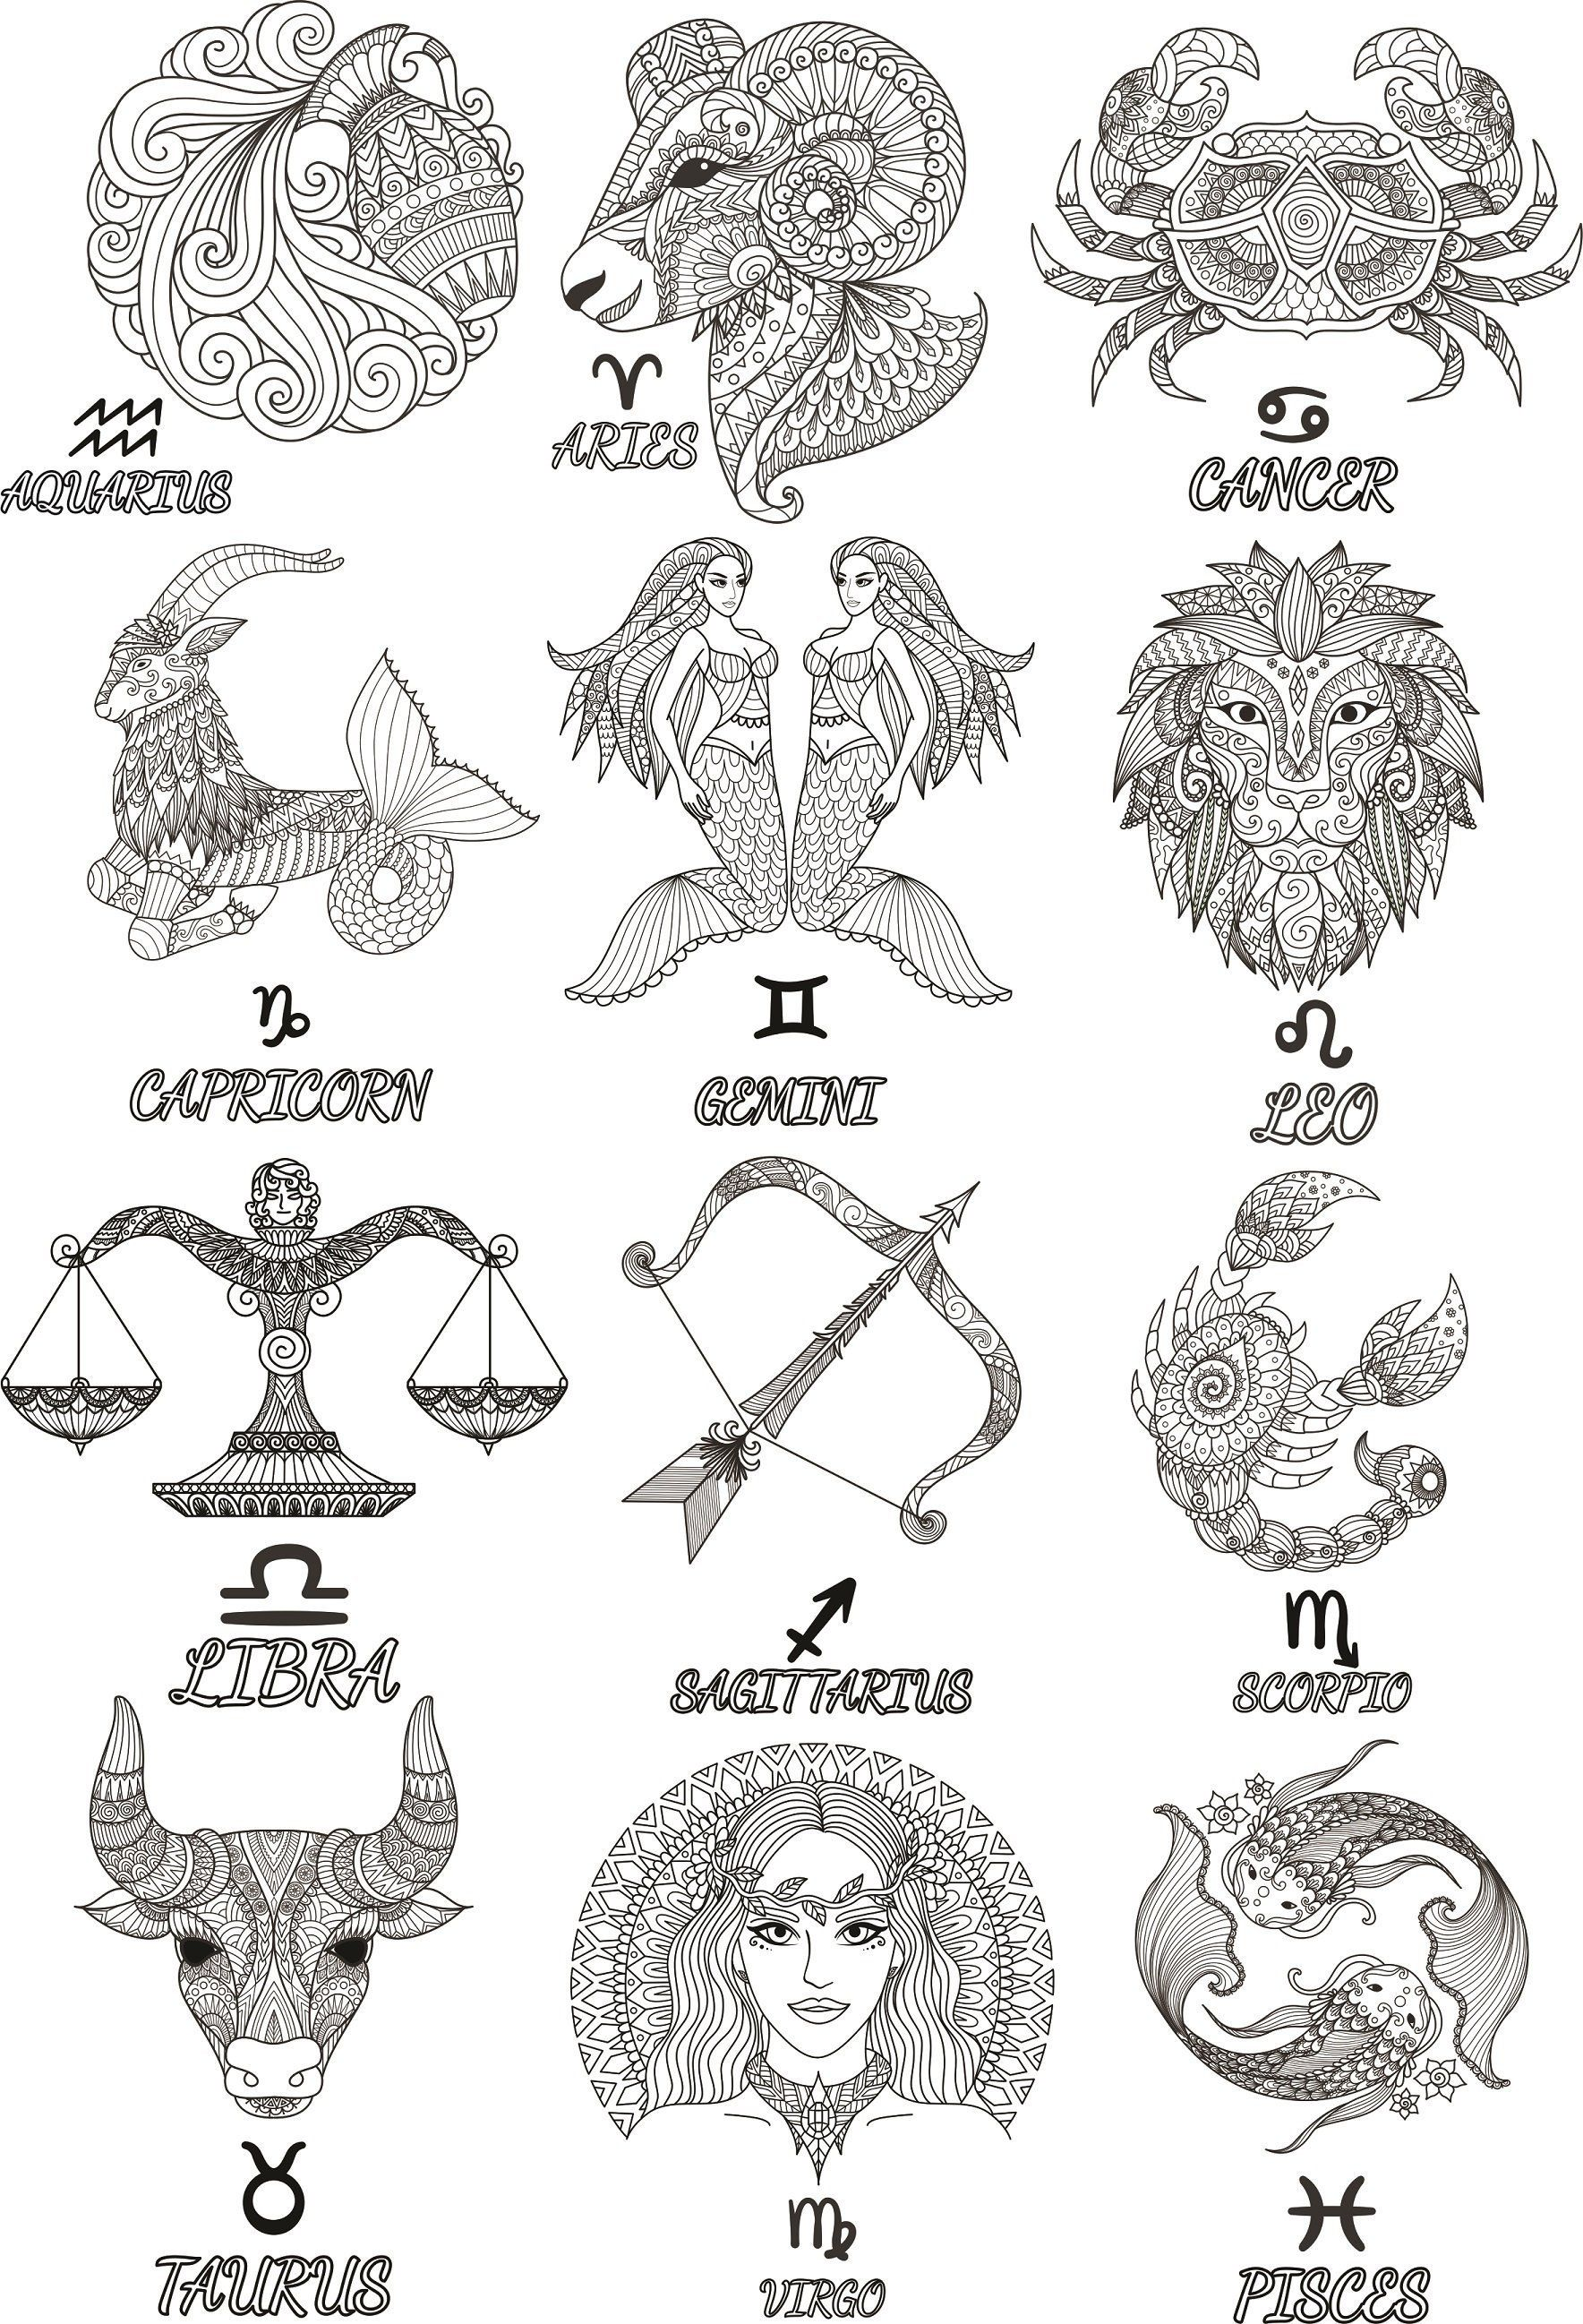 Printable Art Download Stickers Capricorn Zodiac SignsDigital Stickers SVG File